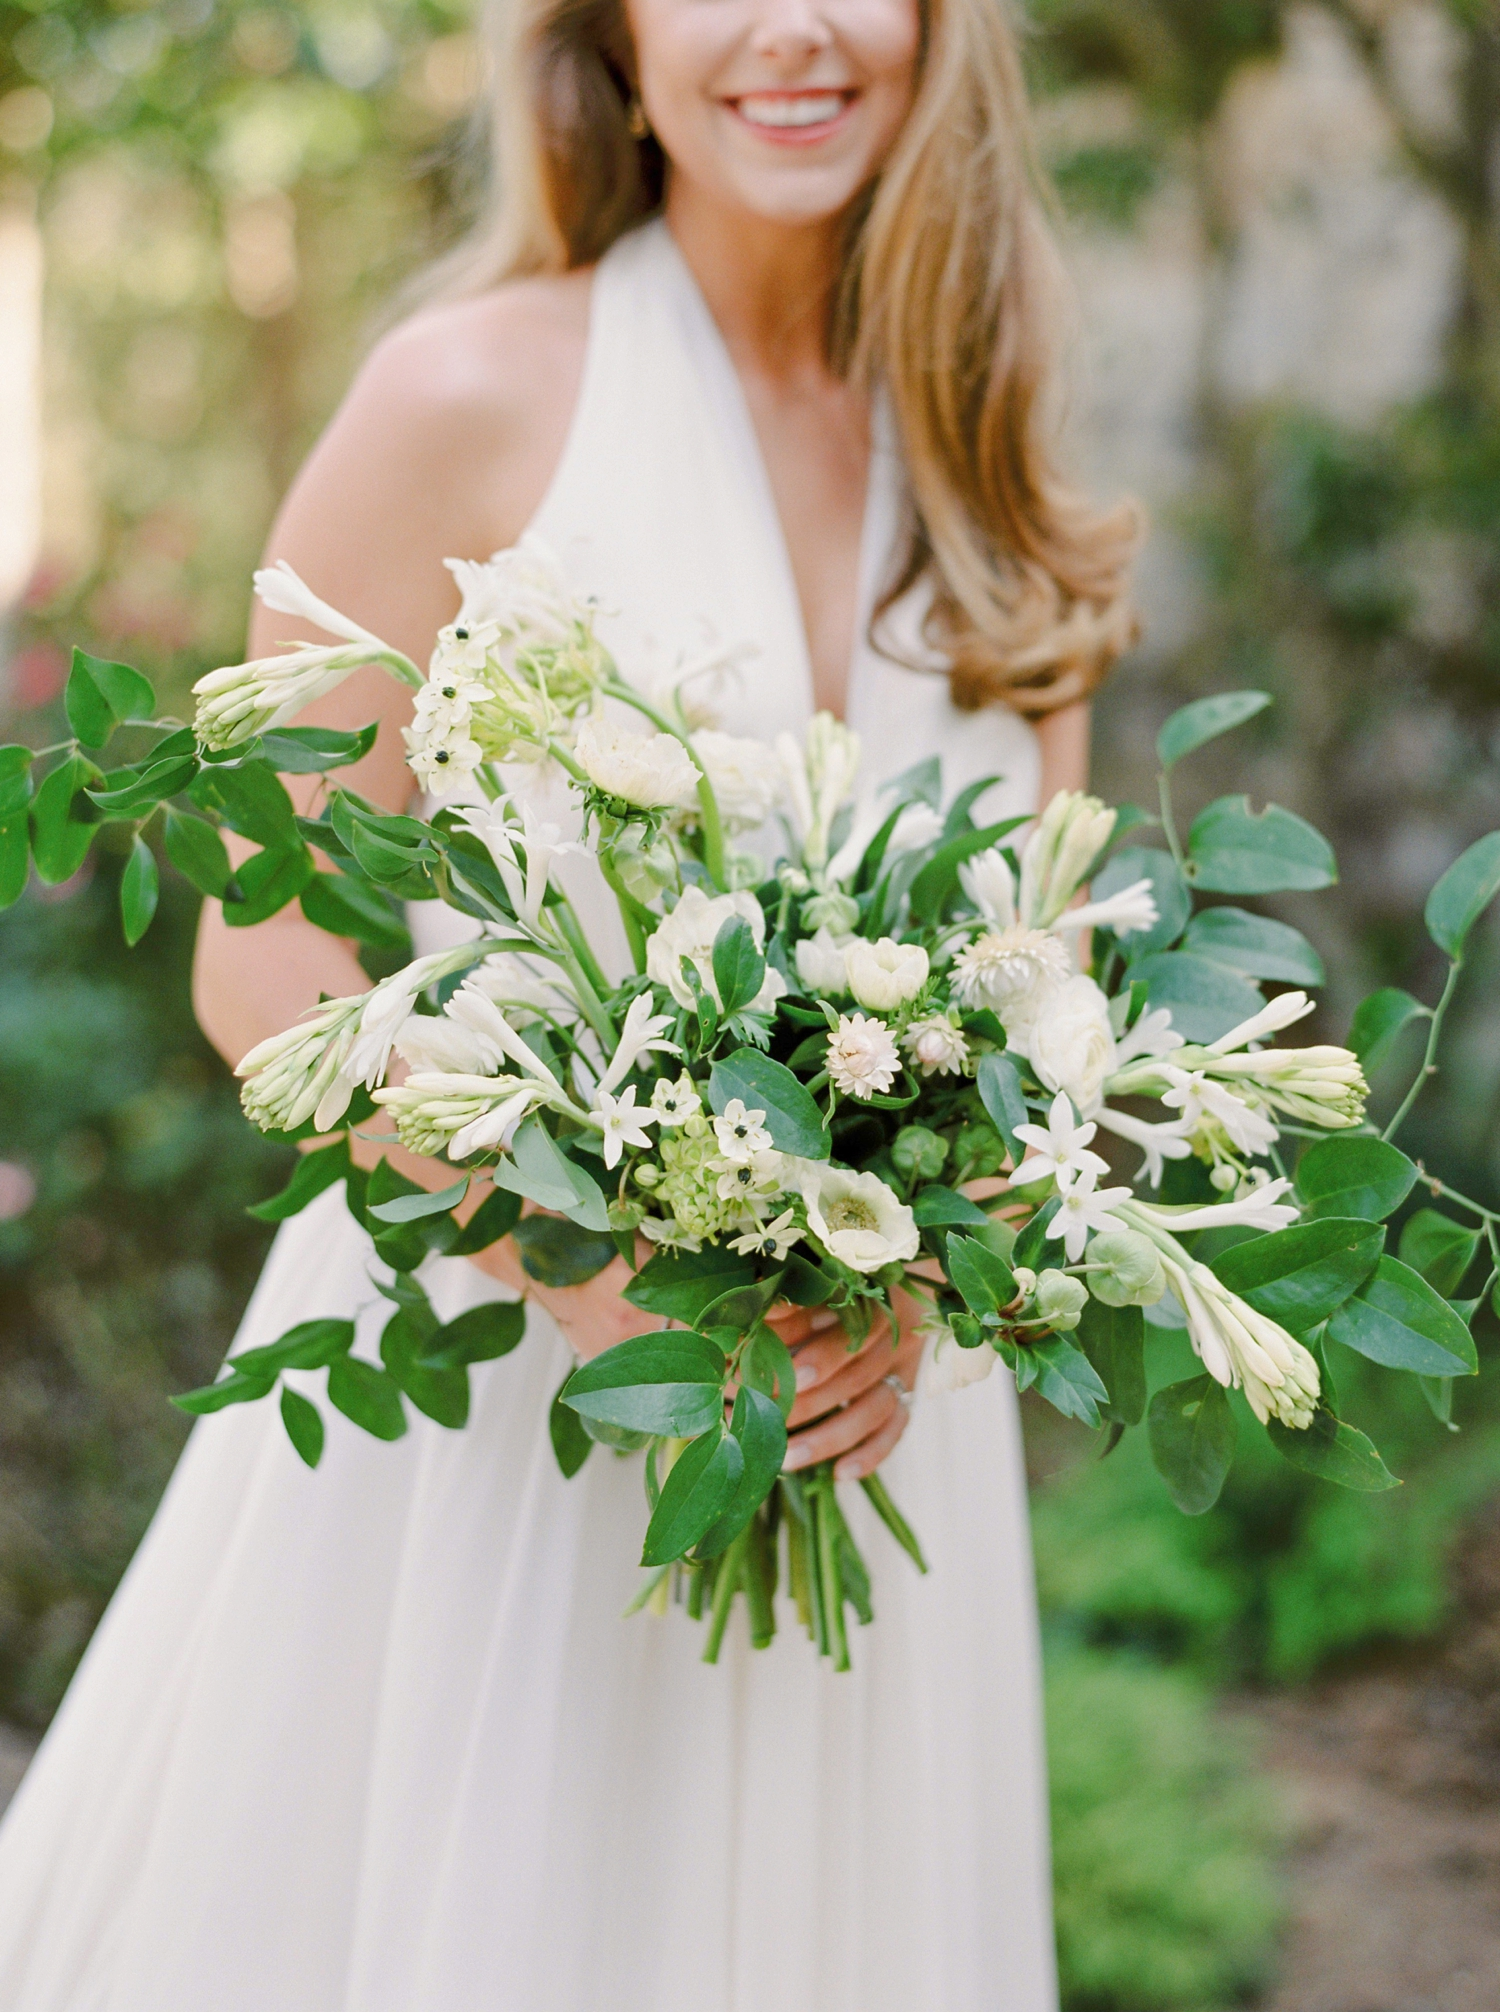 Calgary wedding photographers | georgia wedding photographers | fine art film | Justine Milton Photography | georgia wedding | wedding dress | pastel bouquet | pastel wedding inspiration